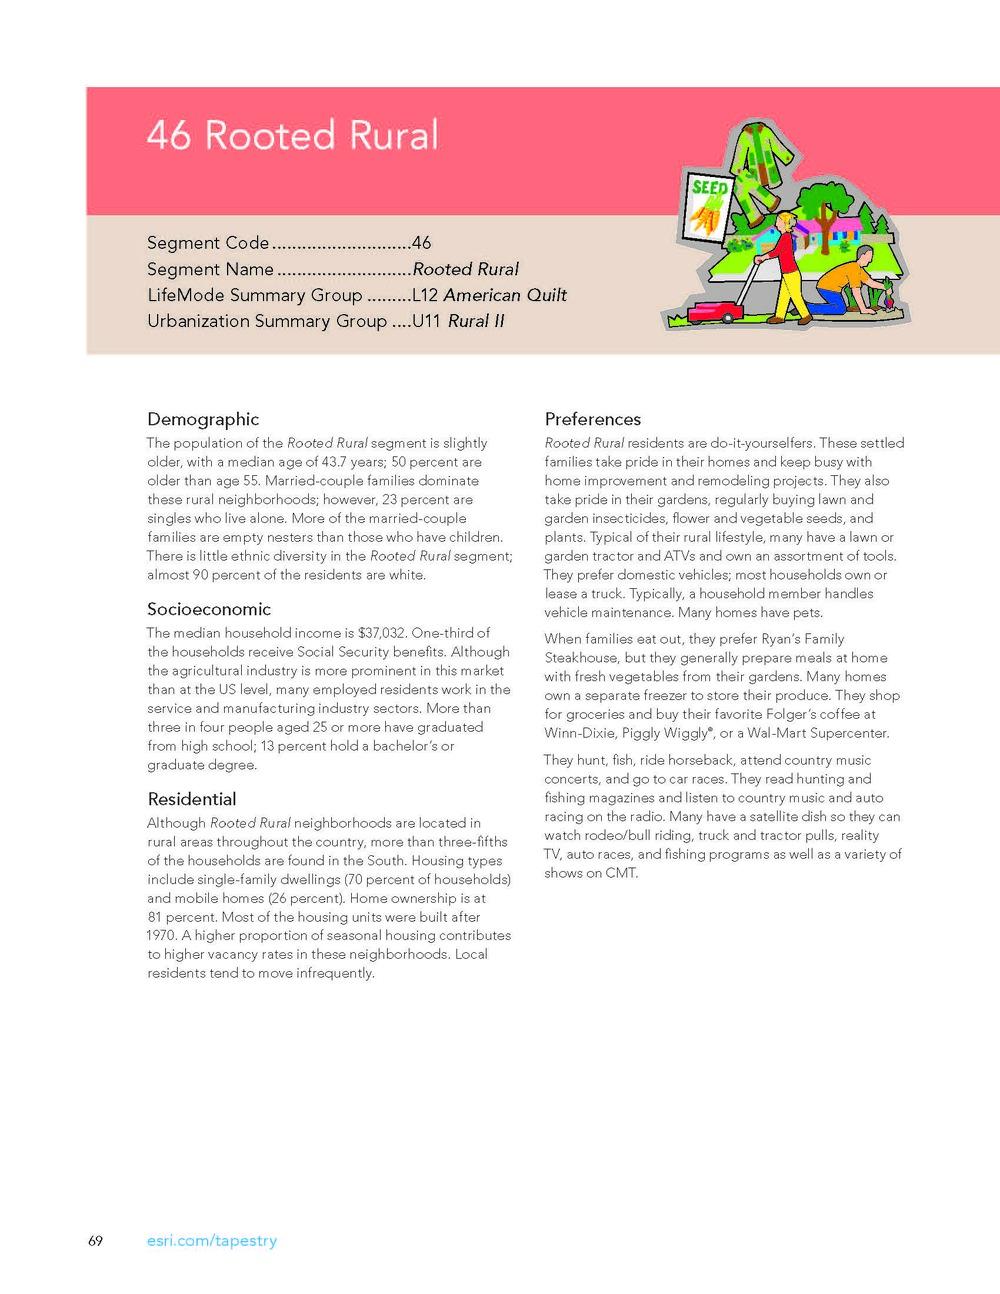 tapestry-segmentation_Page_72.jpg